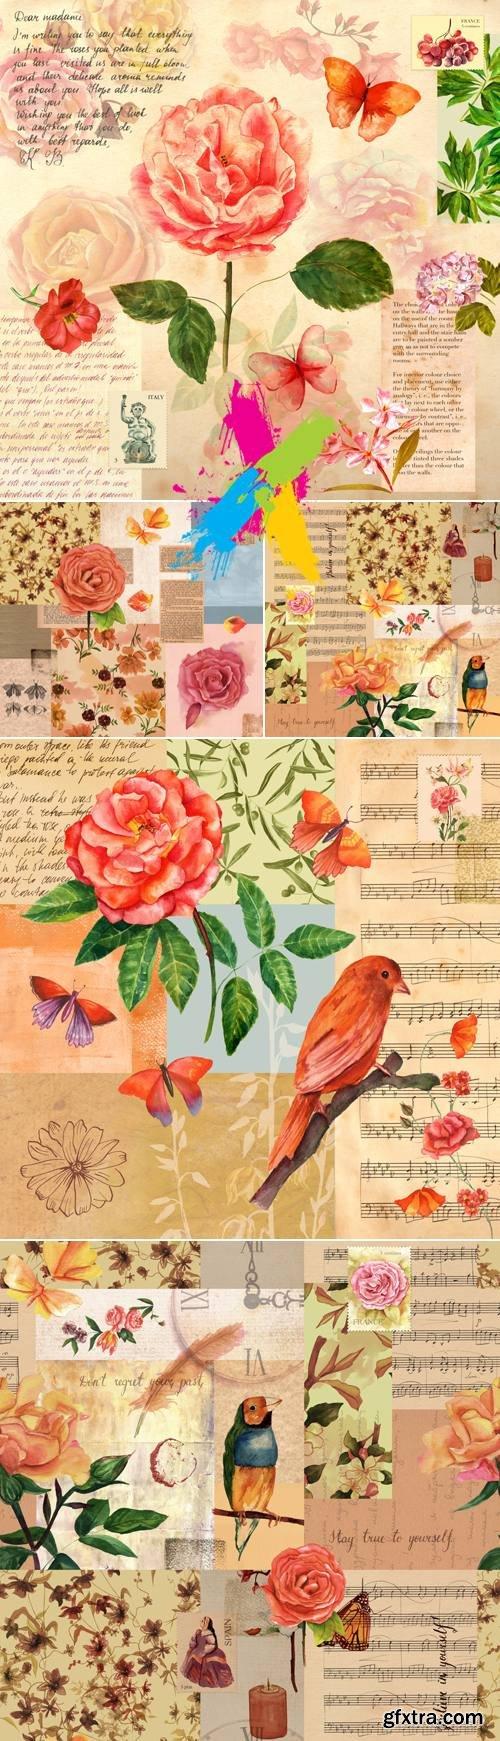 Stock Photo - Vintage Scrapbook Backgrounds